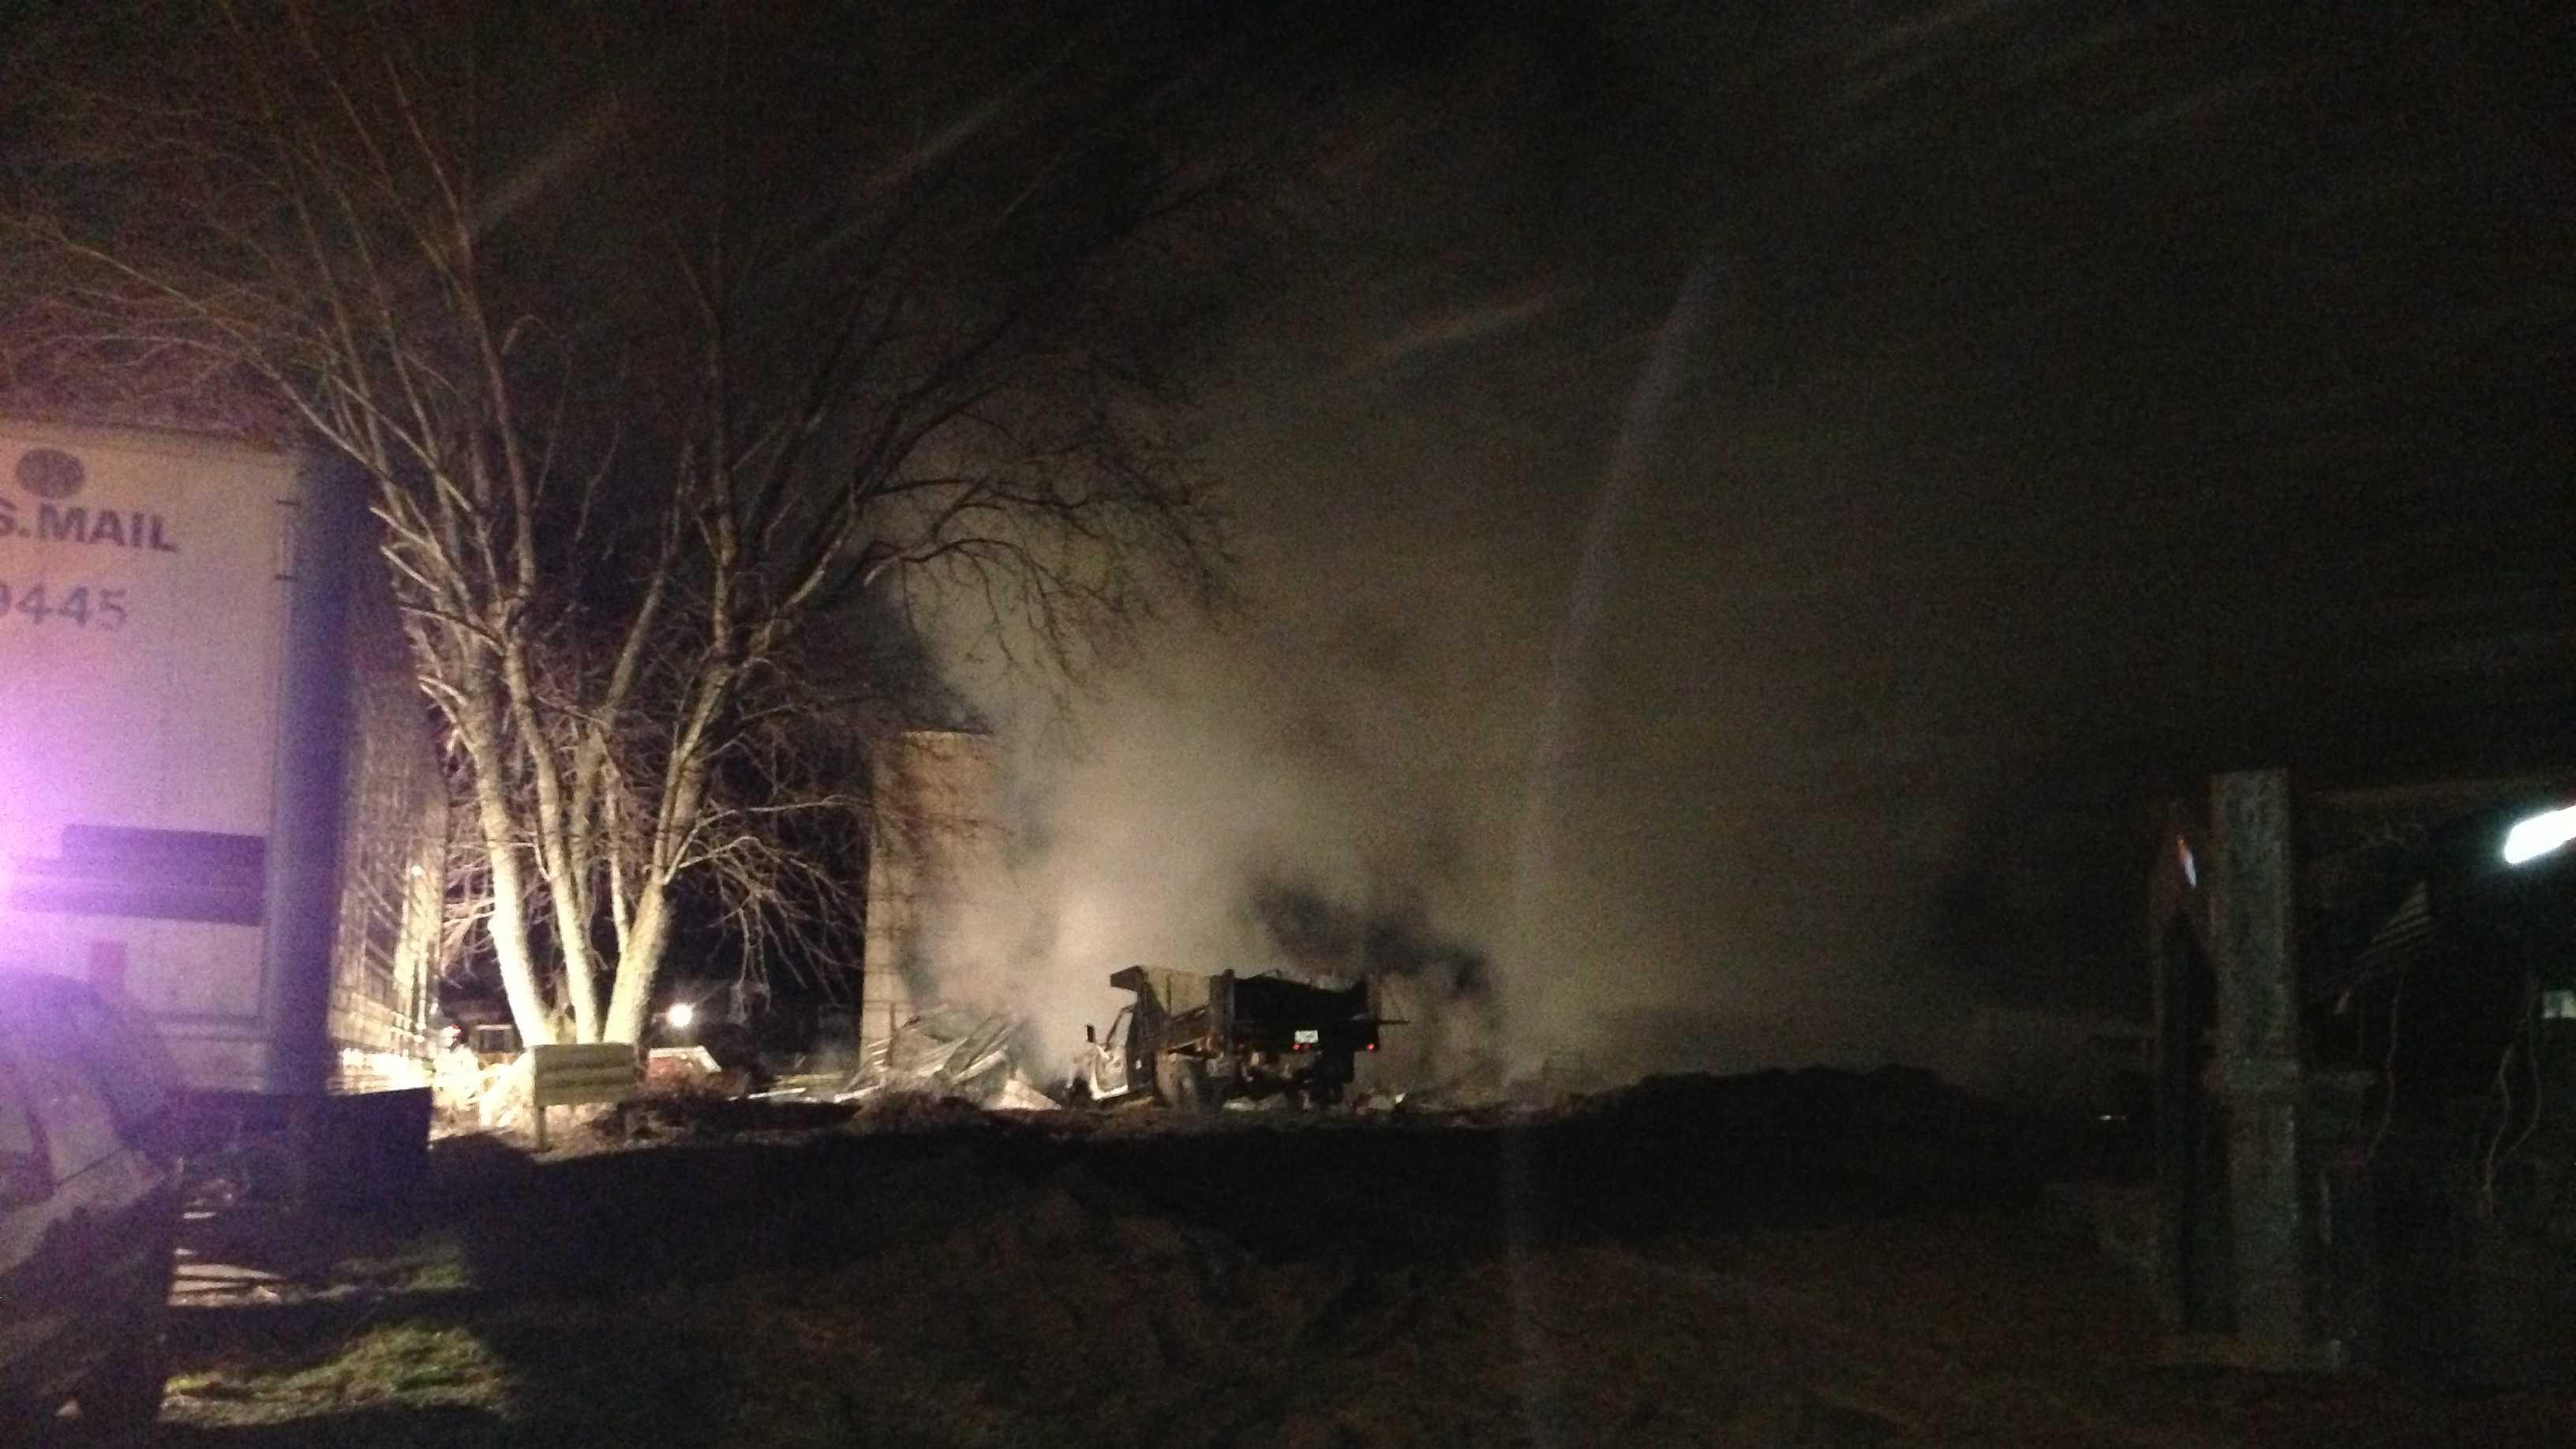 Barn destroyed by fire in burlington